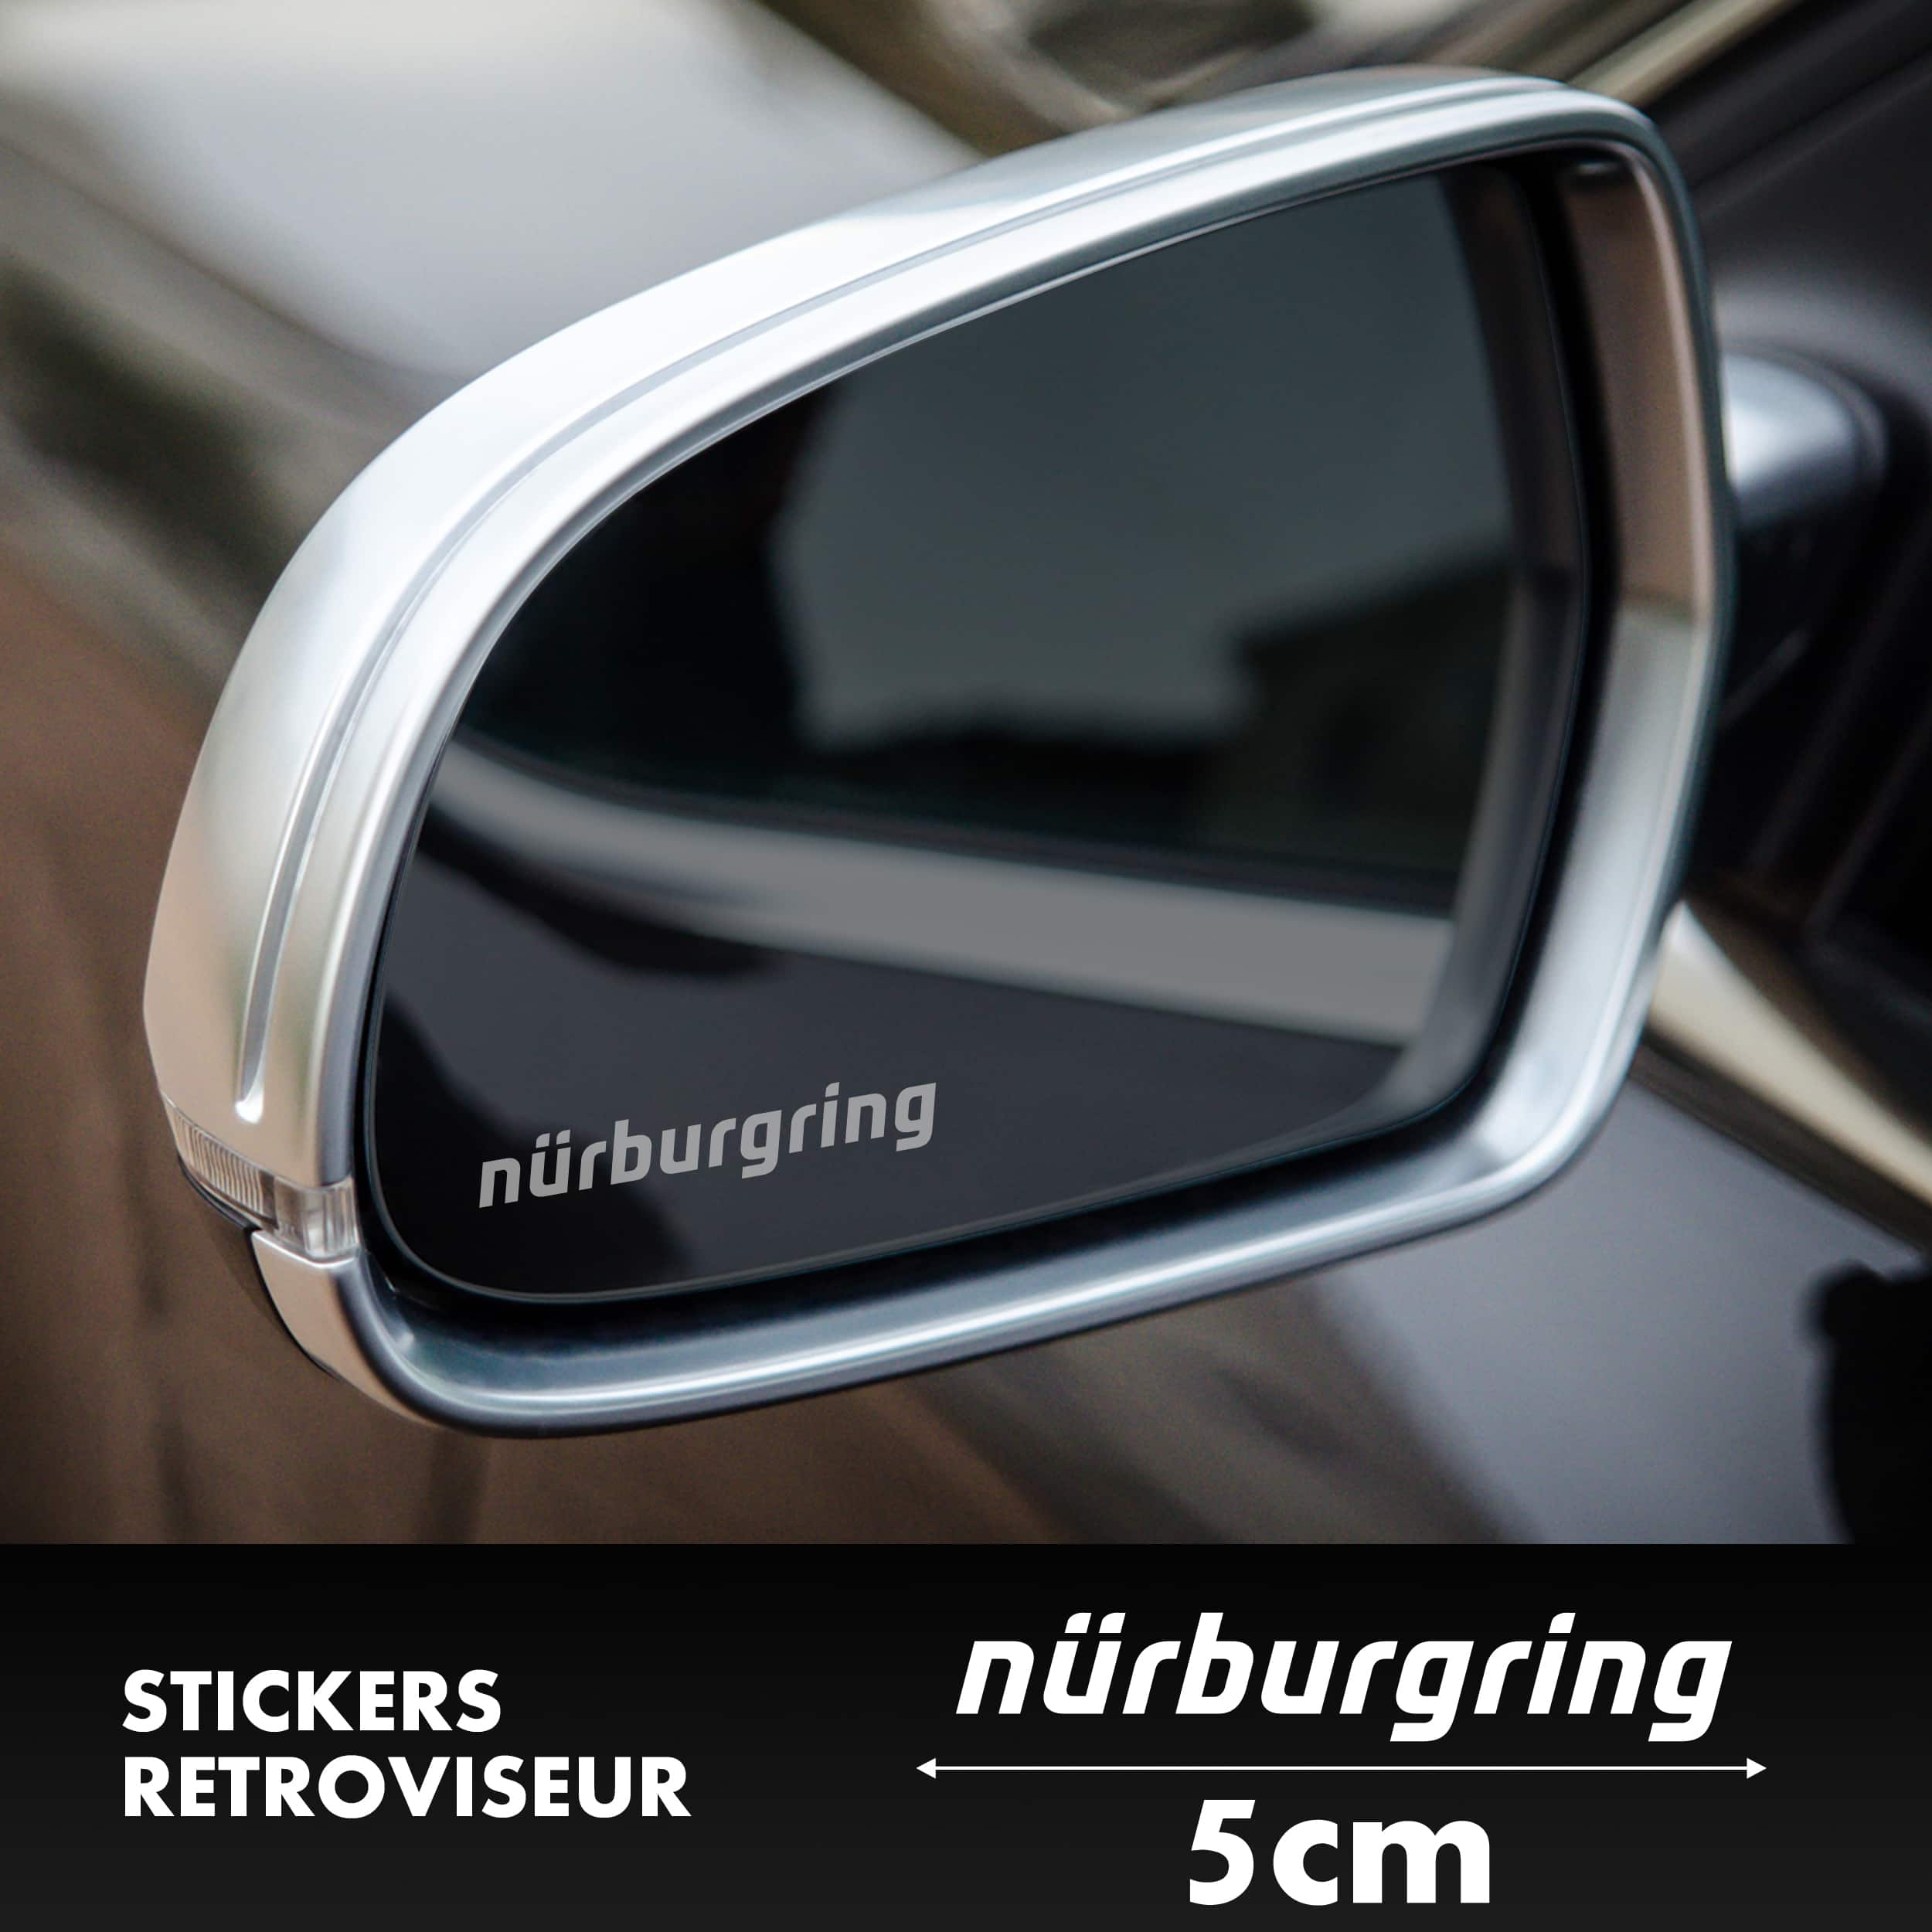 STICKERS RETROVISEUR NURBURGRING